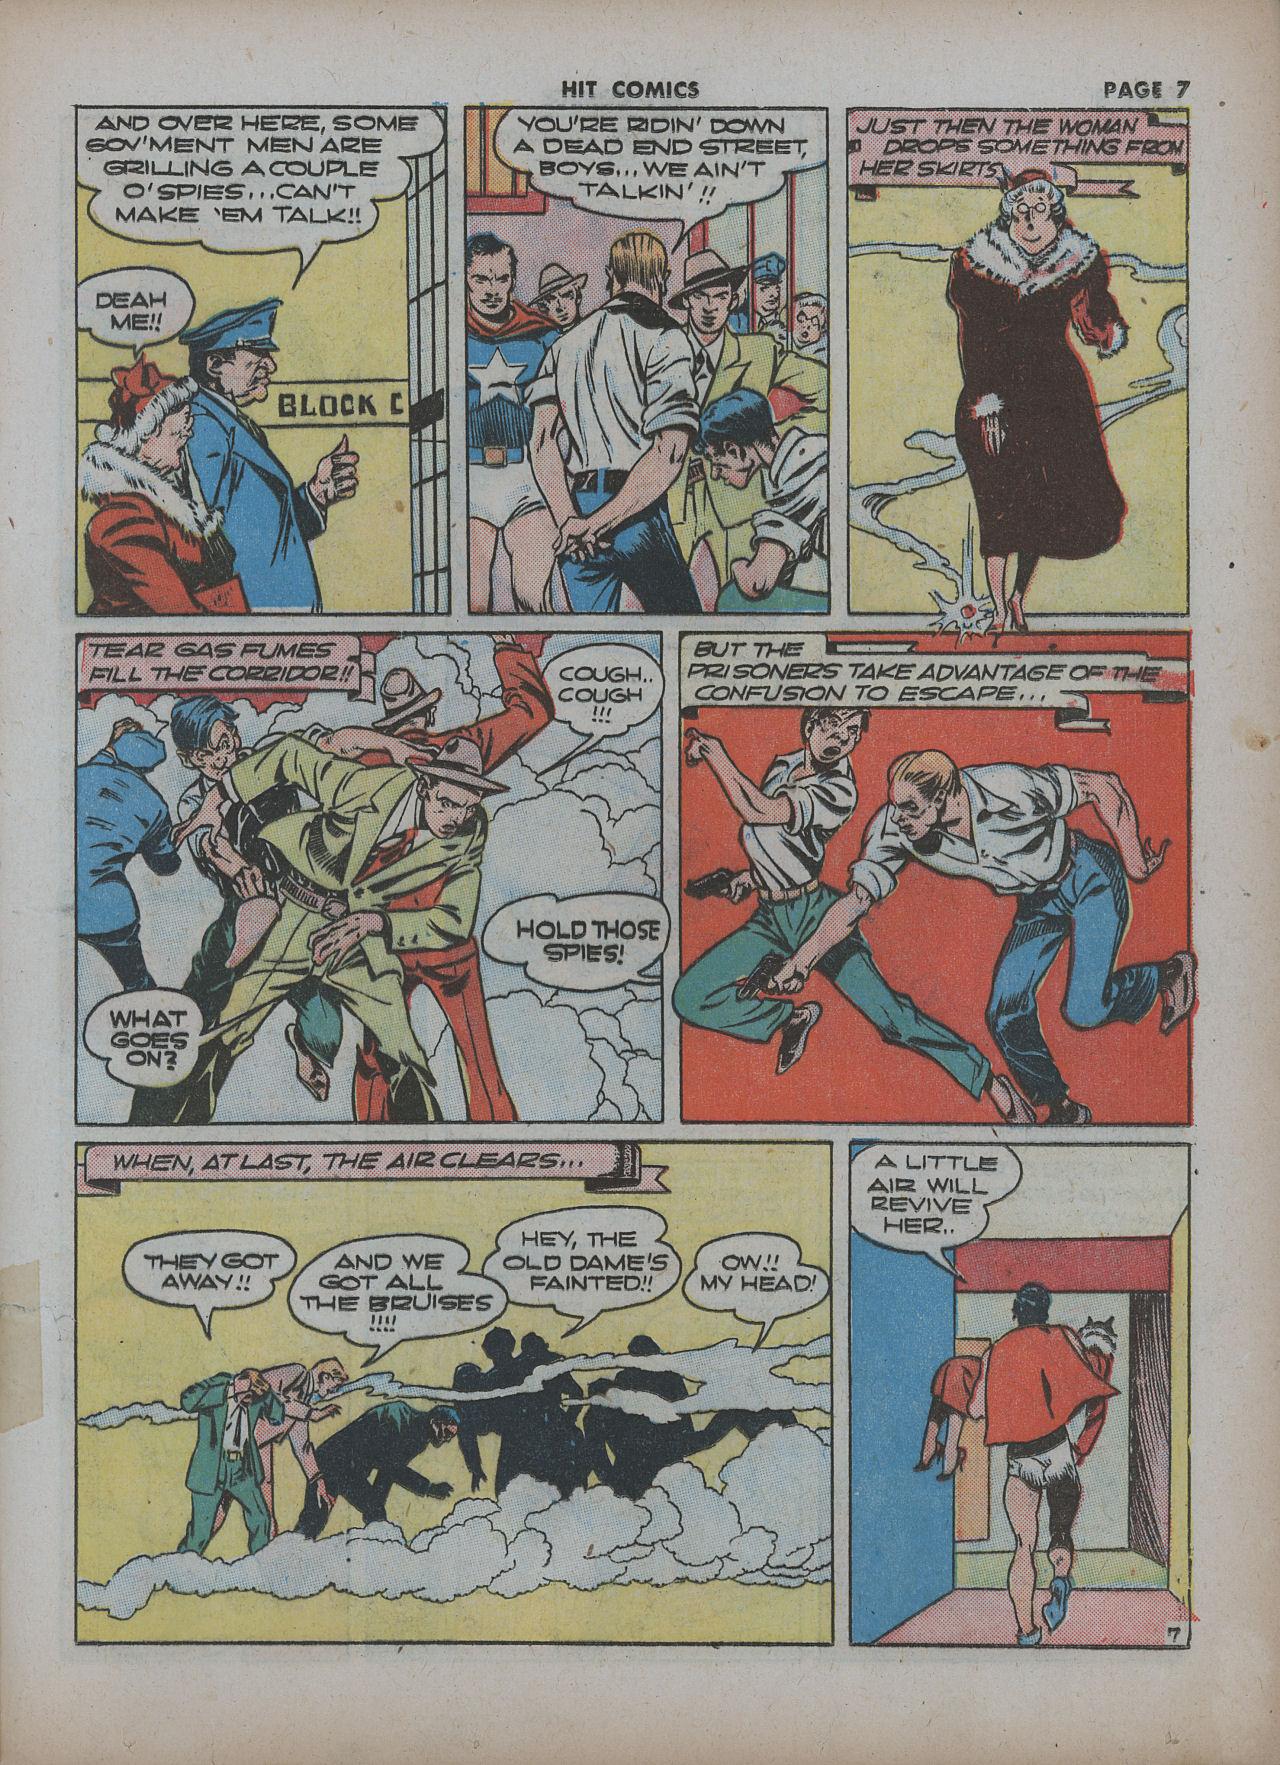 Read online Hit Comics comic -  Issue #22 - 9